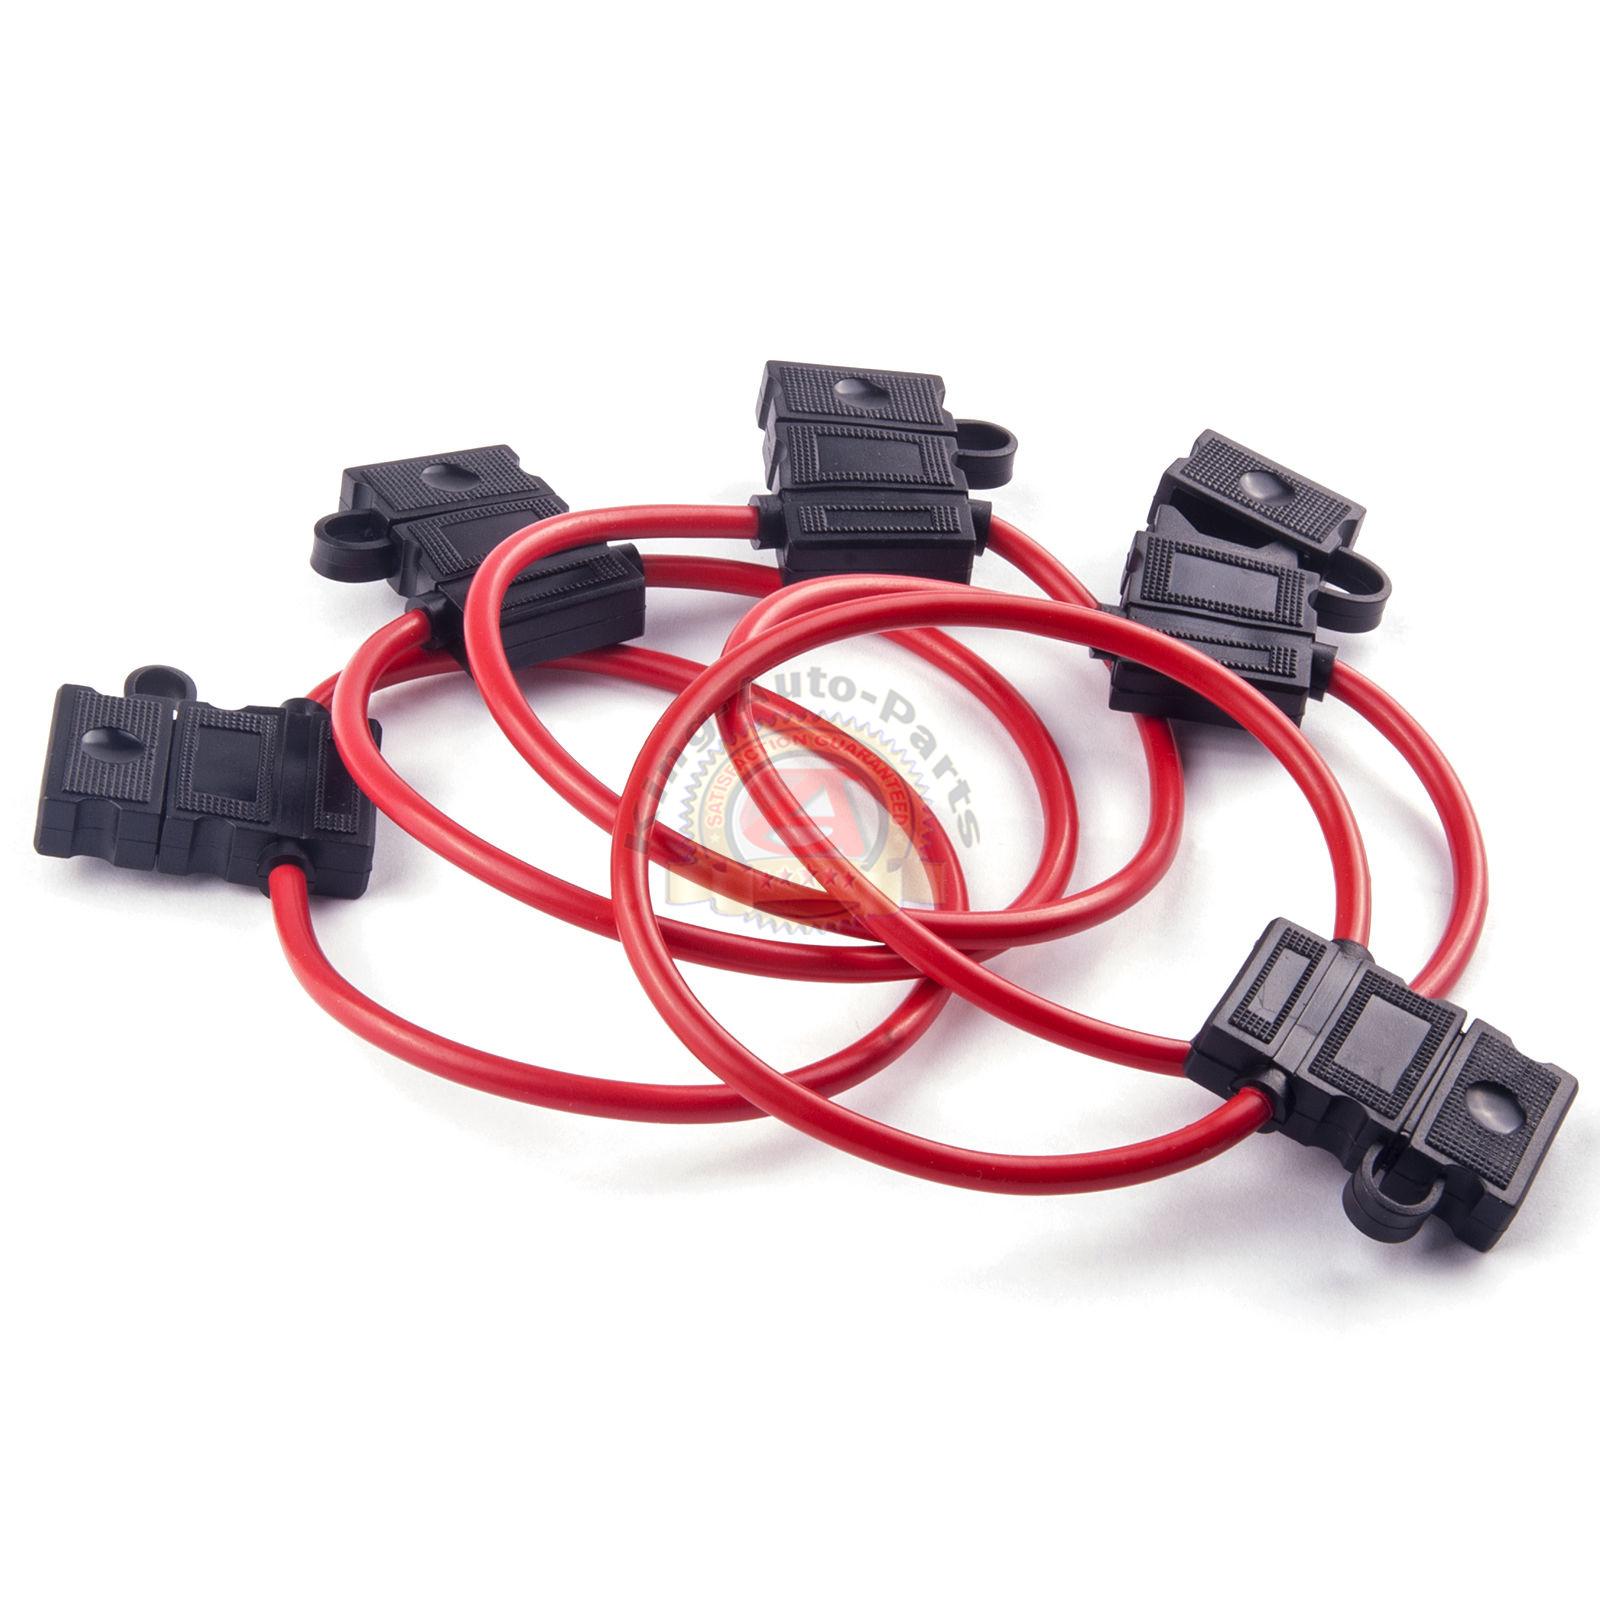 Flotec pump wiring diagram deep well